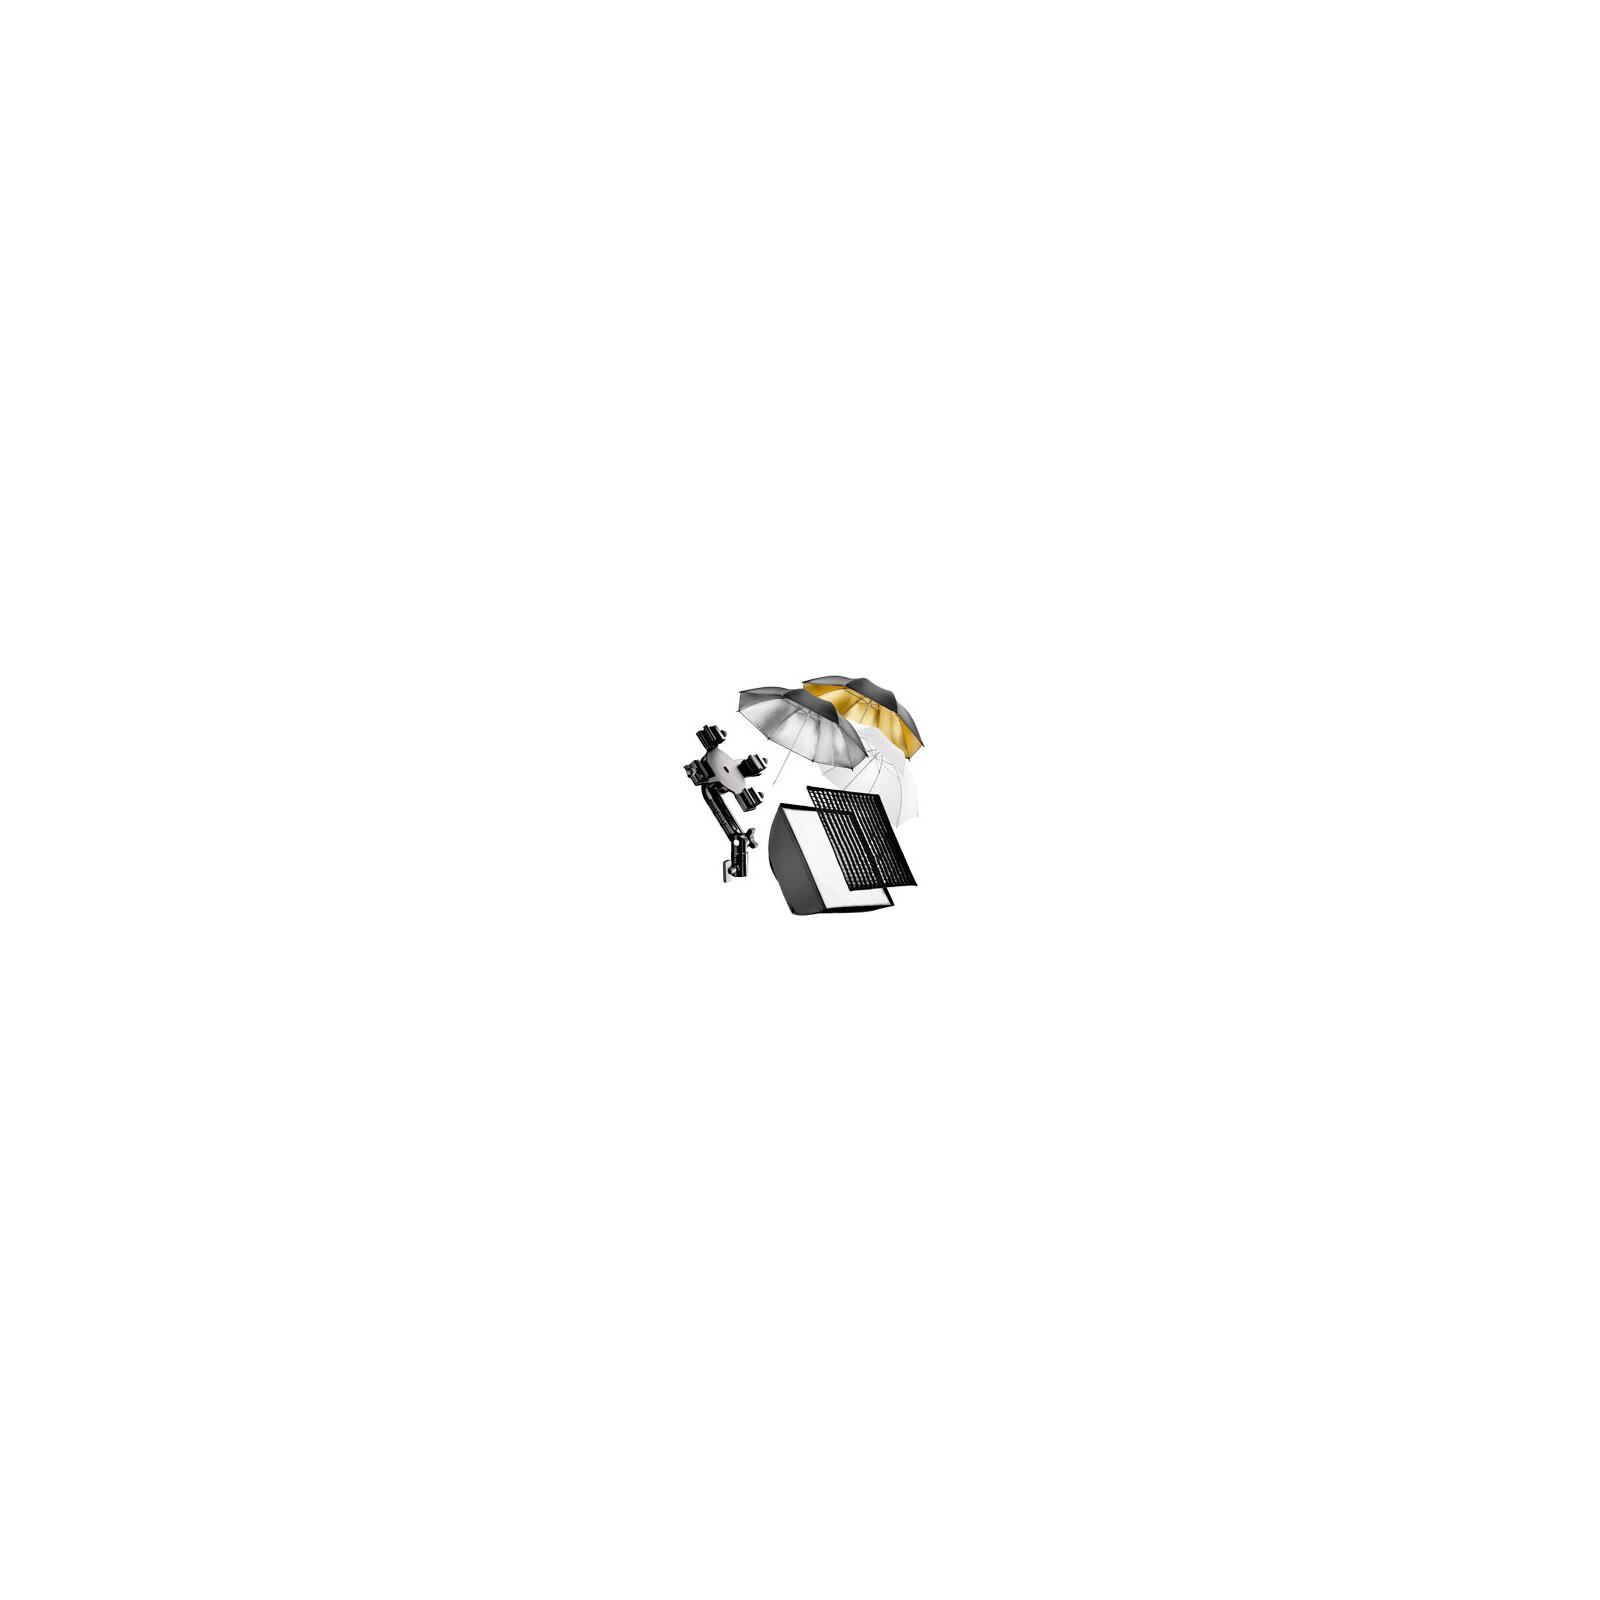 walimex 4f. Blitzhalter inkl. Softbox u. Schirmset